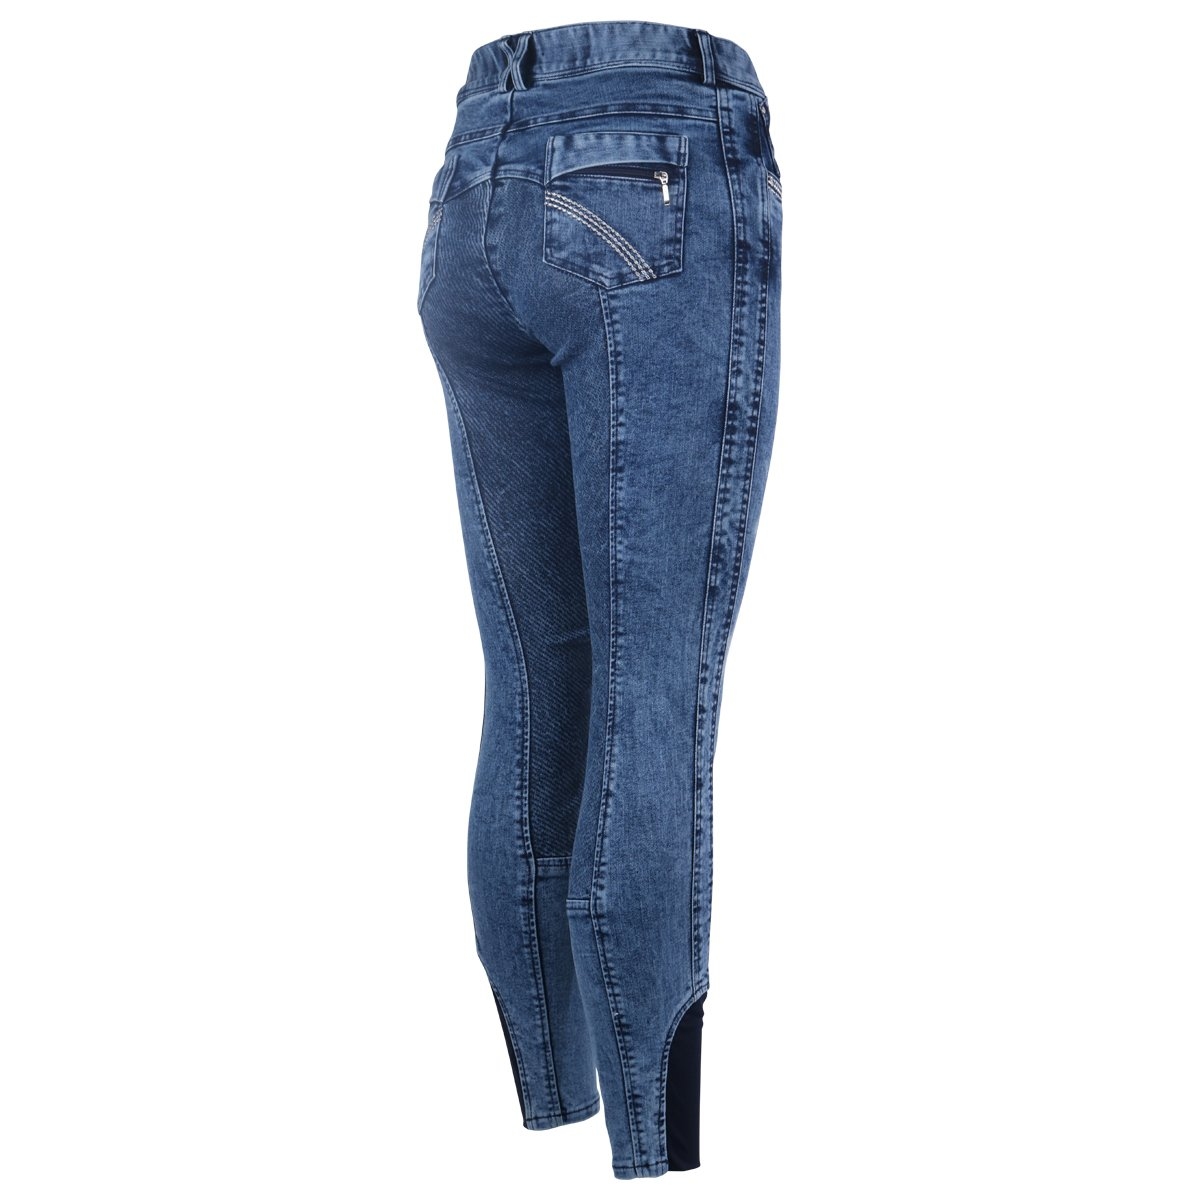 Imperial Riding Damen Reithose Exotic Jeans Look B079ZXPBP2 Reithosen Adoptieren Adoptieren Adoptieren 3e51ed